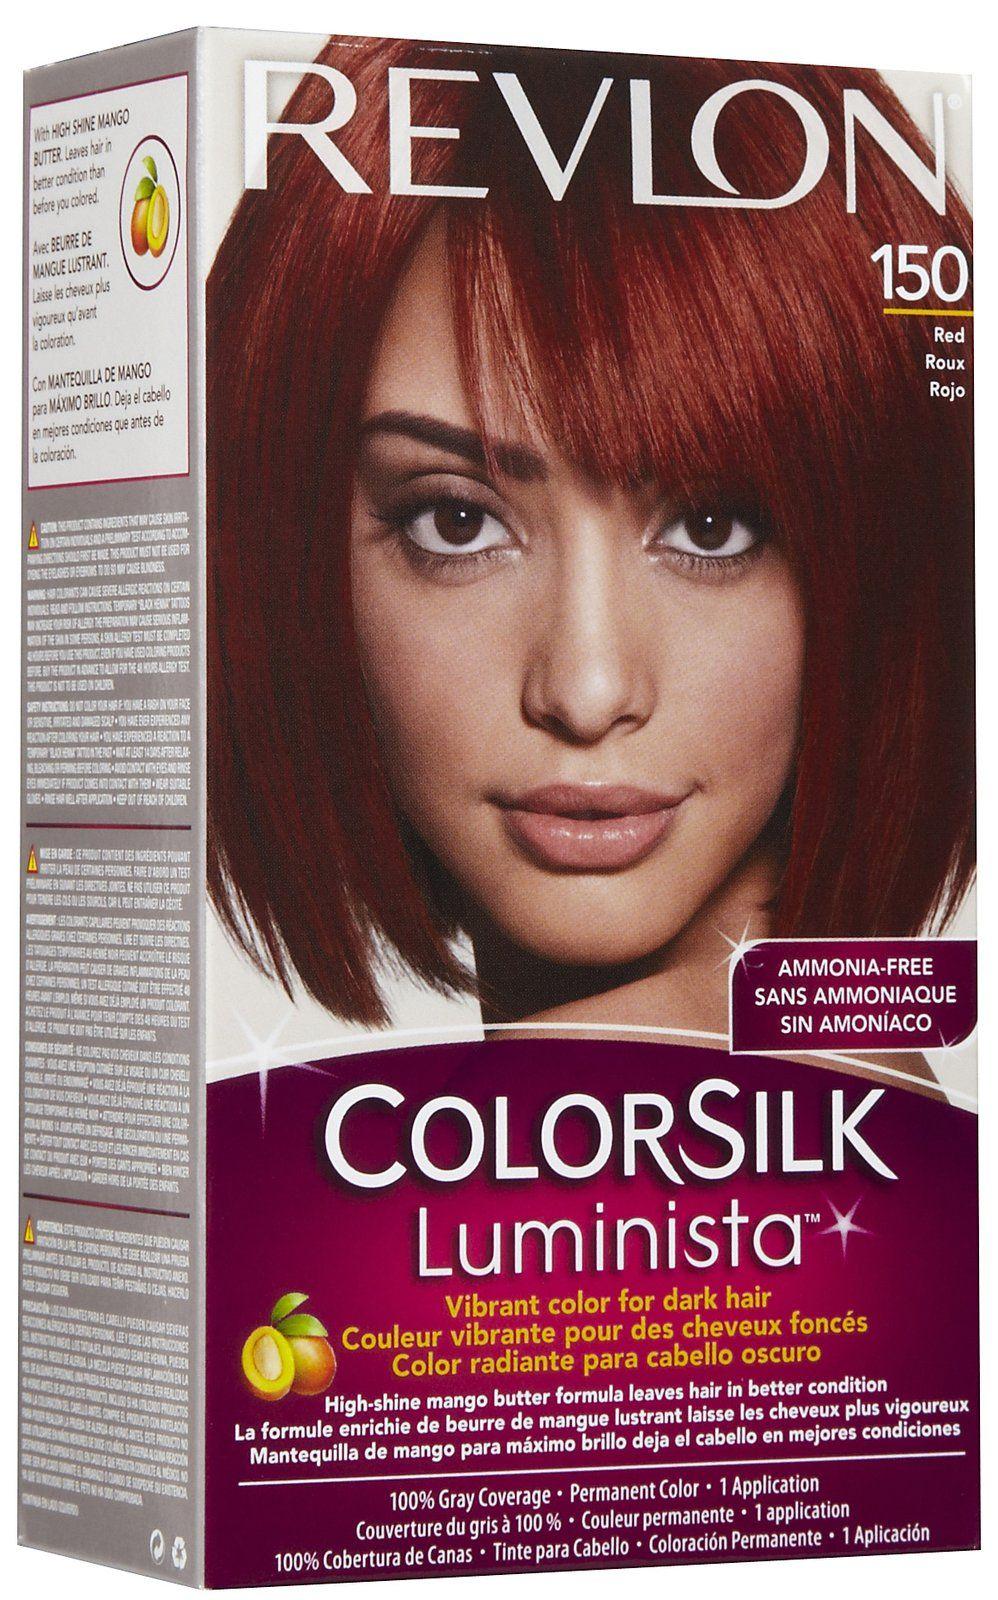 Revlon Colorsilk Luminista Permanent Hair Color Light Red Hair